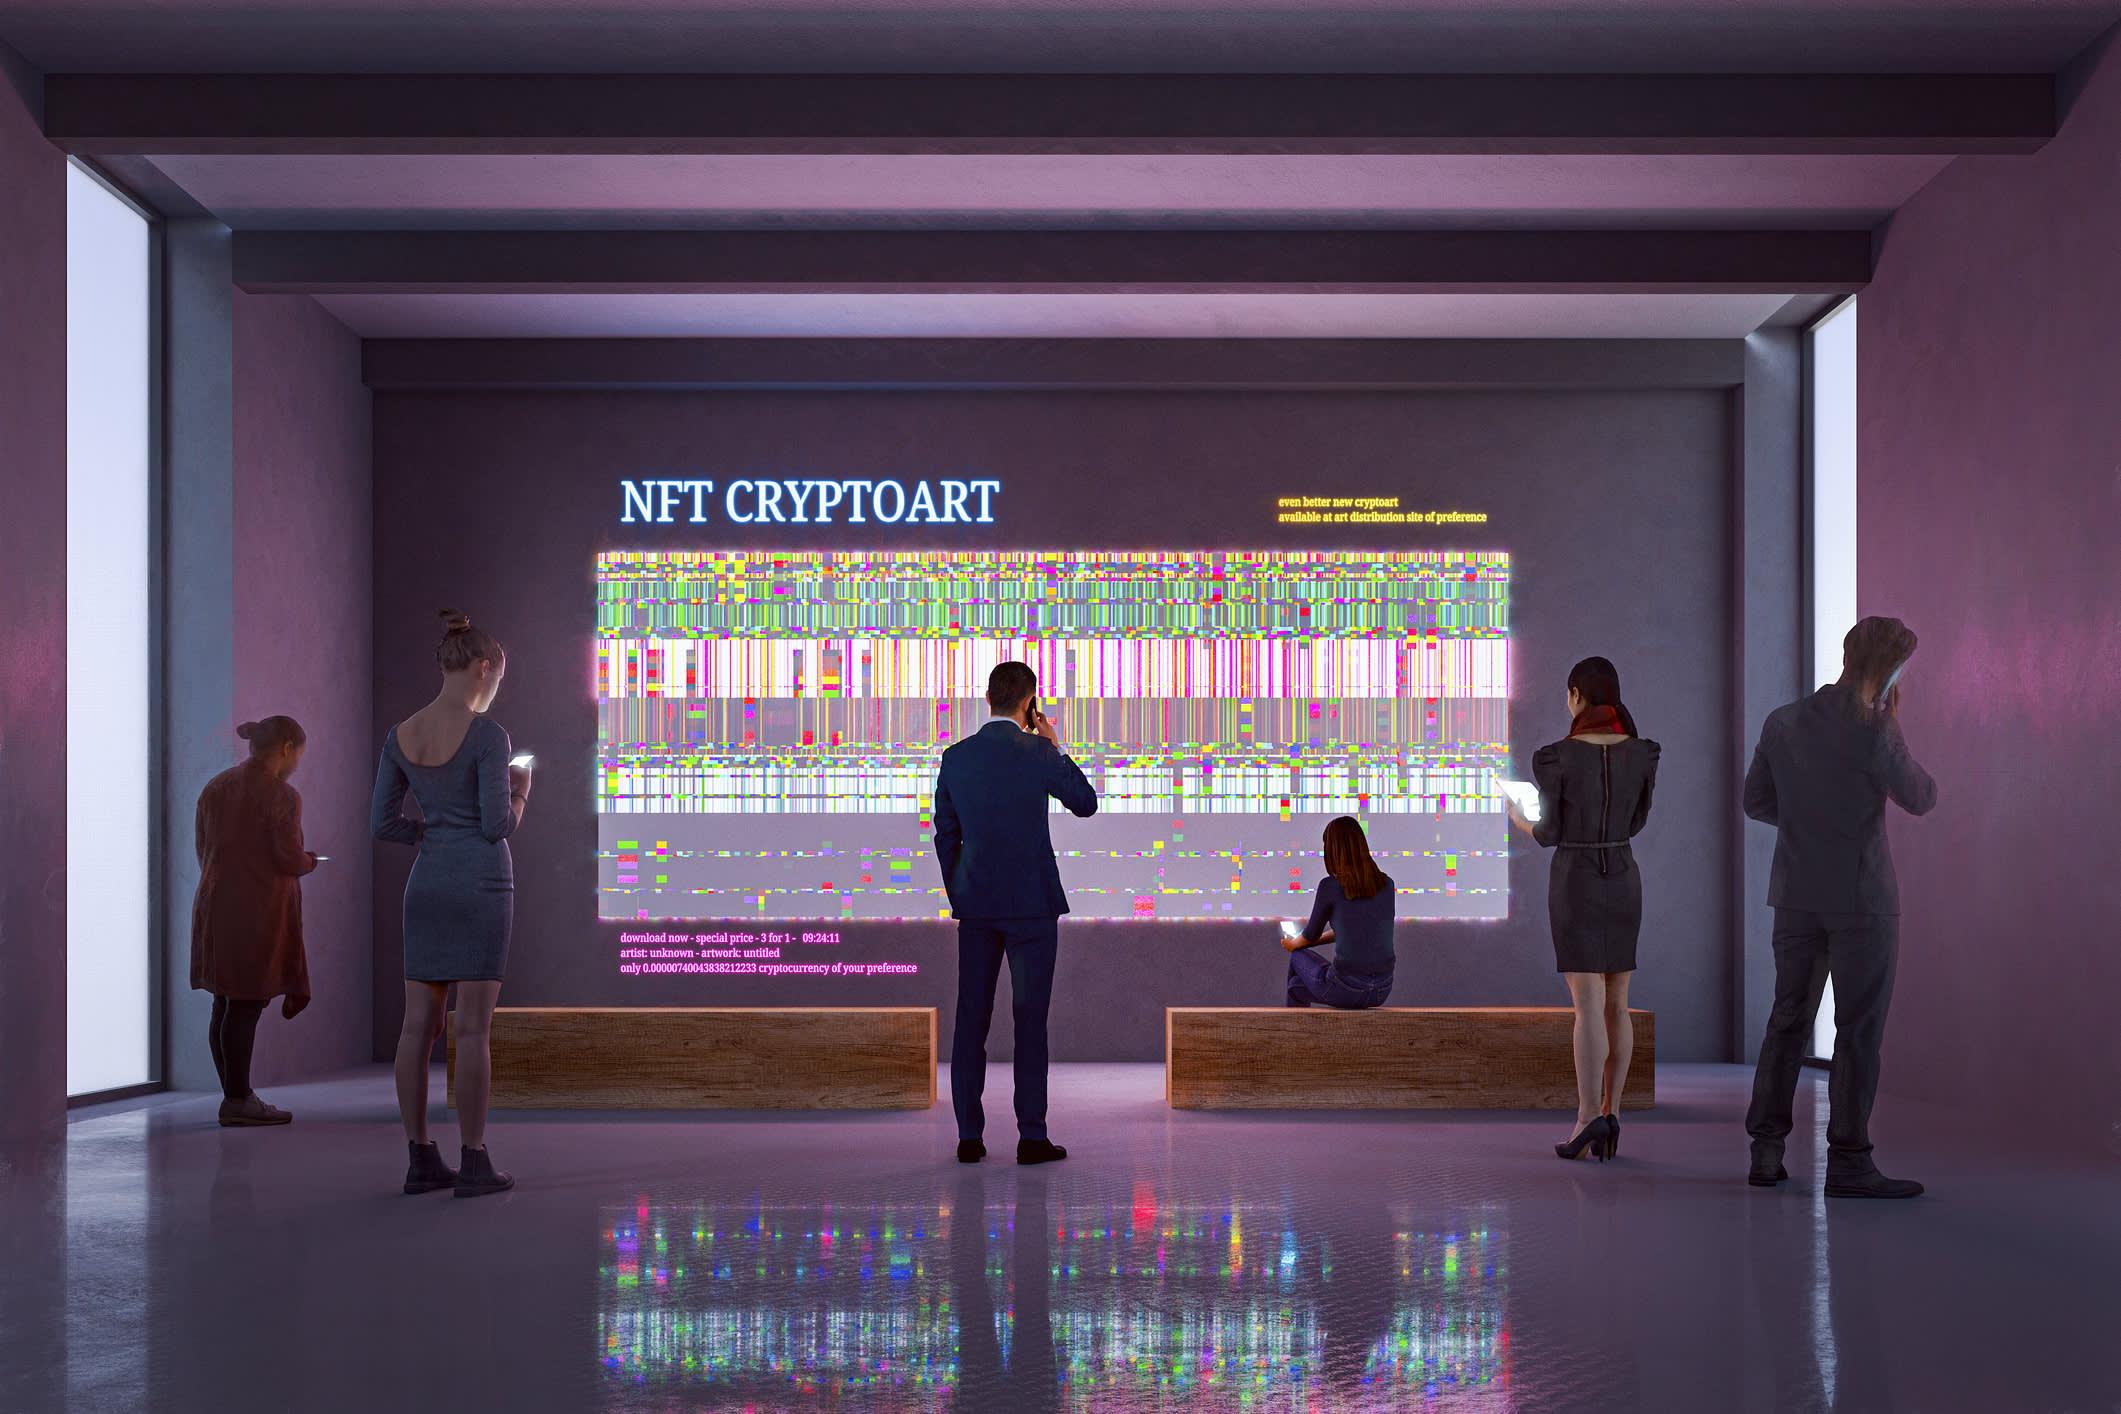 Tech investors pump millions into NFT start-ups as digital collectibles boom